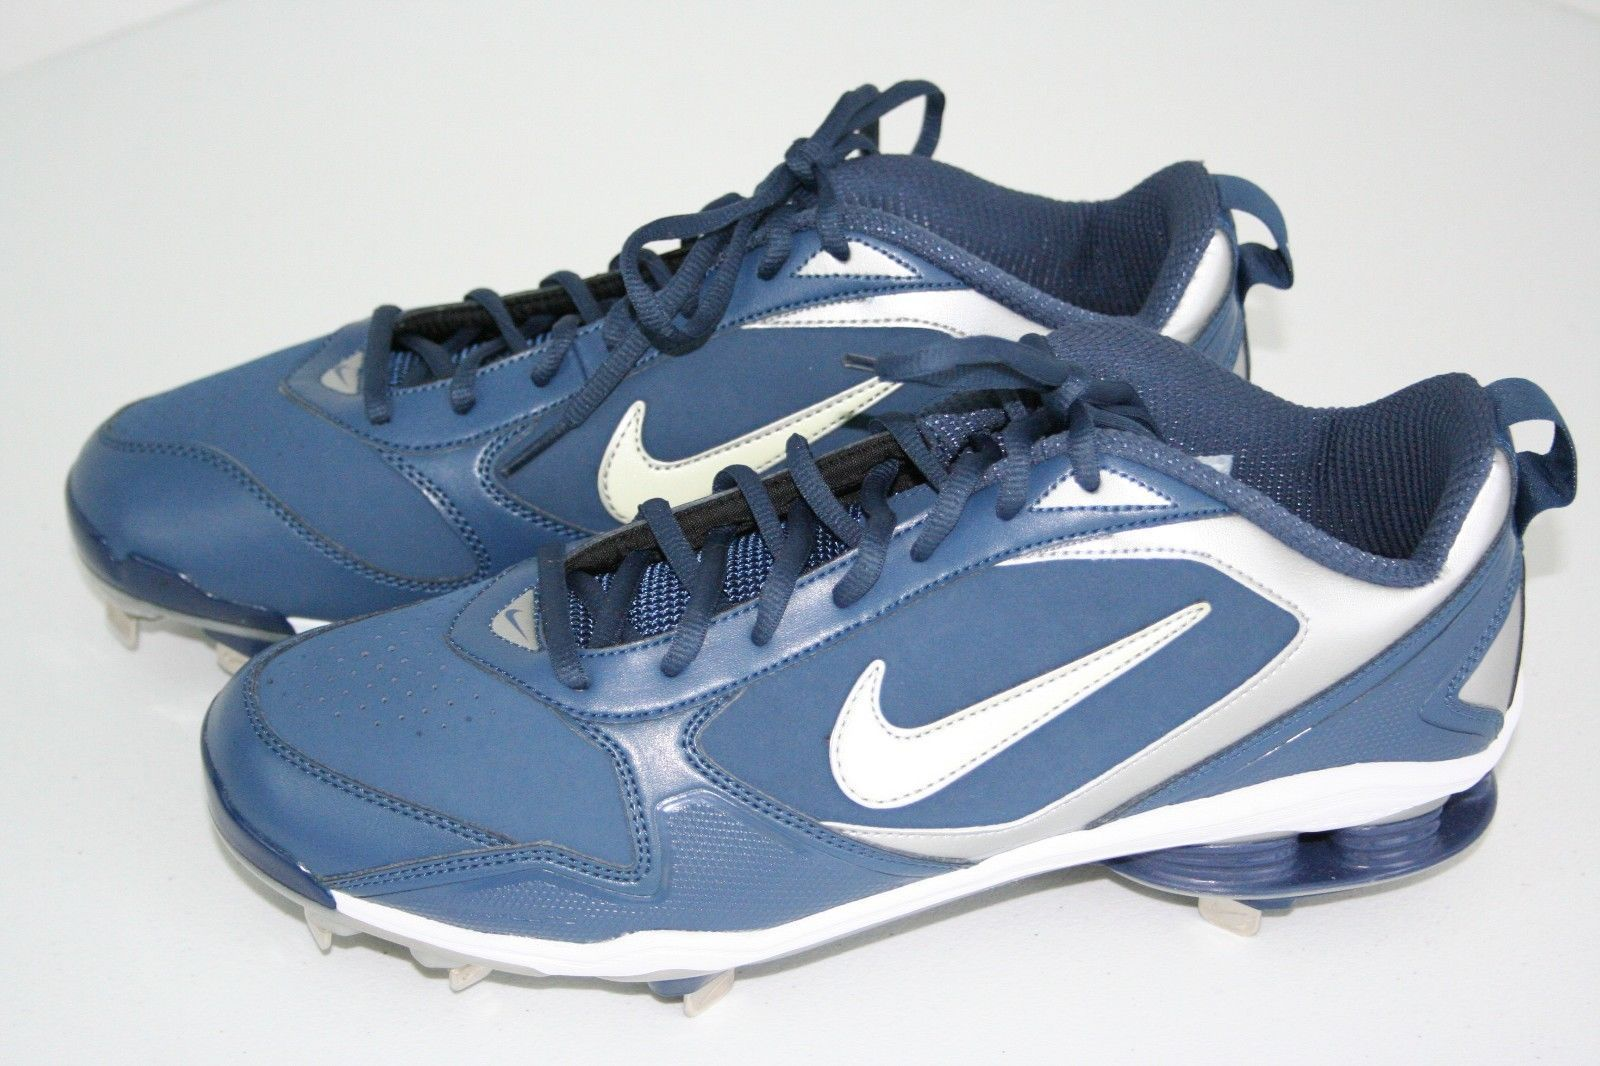 the latest 64243 e6da9 Nike Air ZOOM SHOX FUSE METAL BASEBALL CLEATS NEW 317029 Blue 11.5 Men